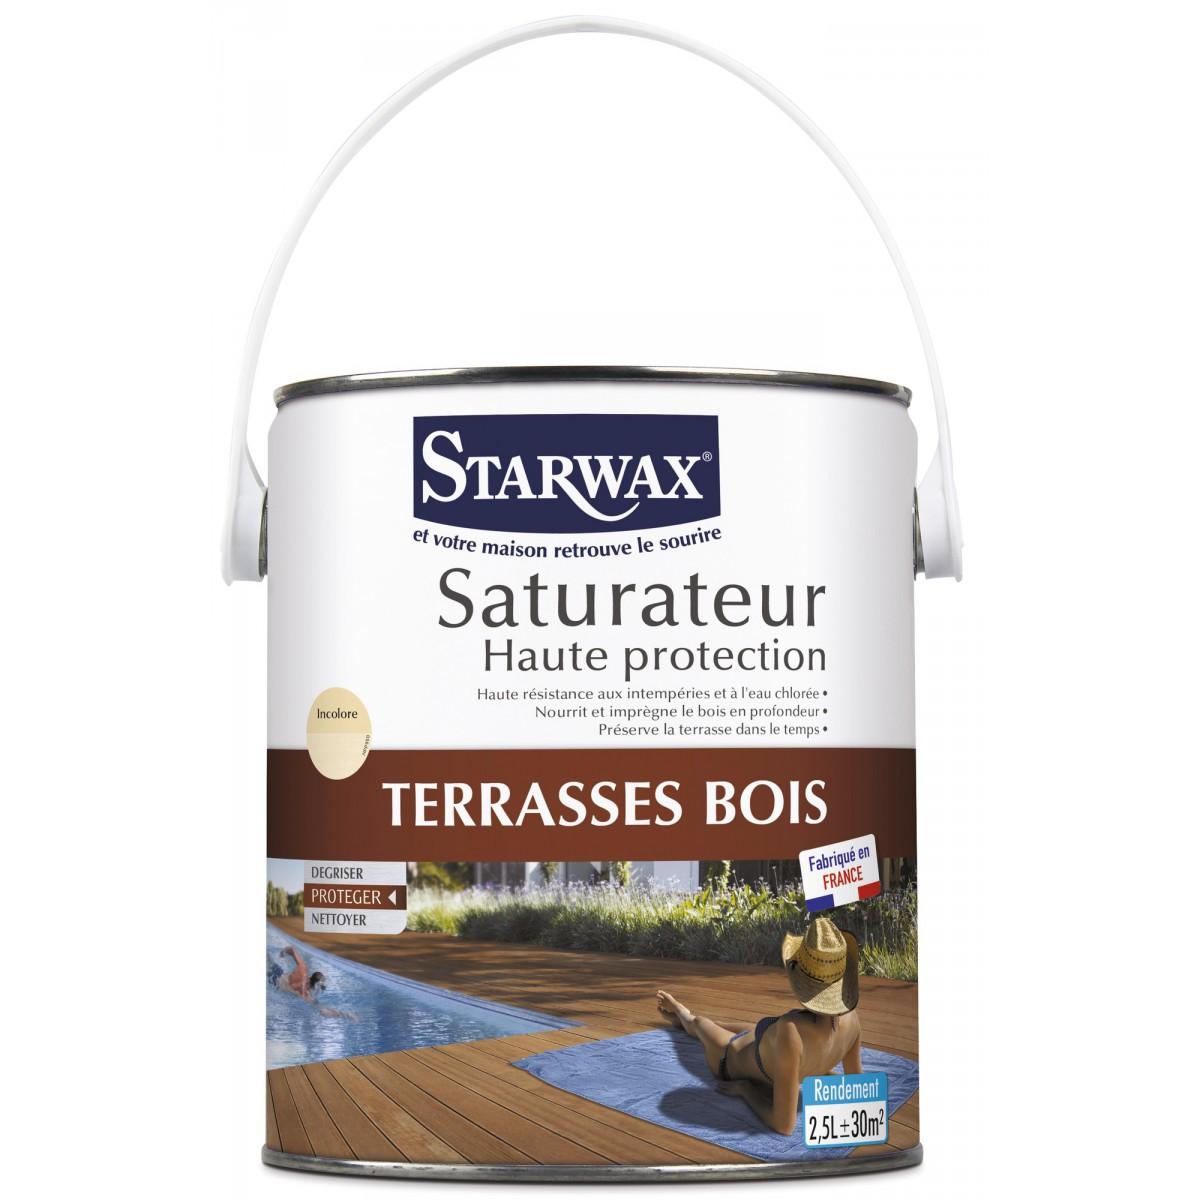 Protection terrasses bois Starwax - Bidon 2,5 l